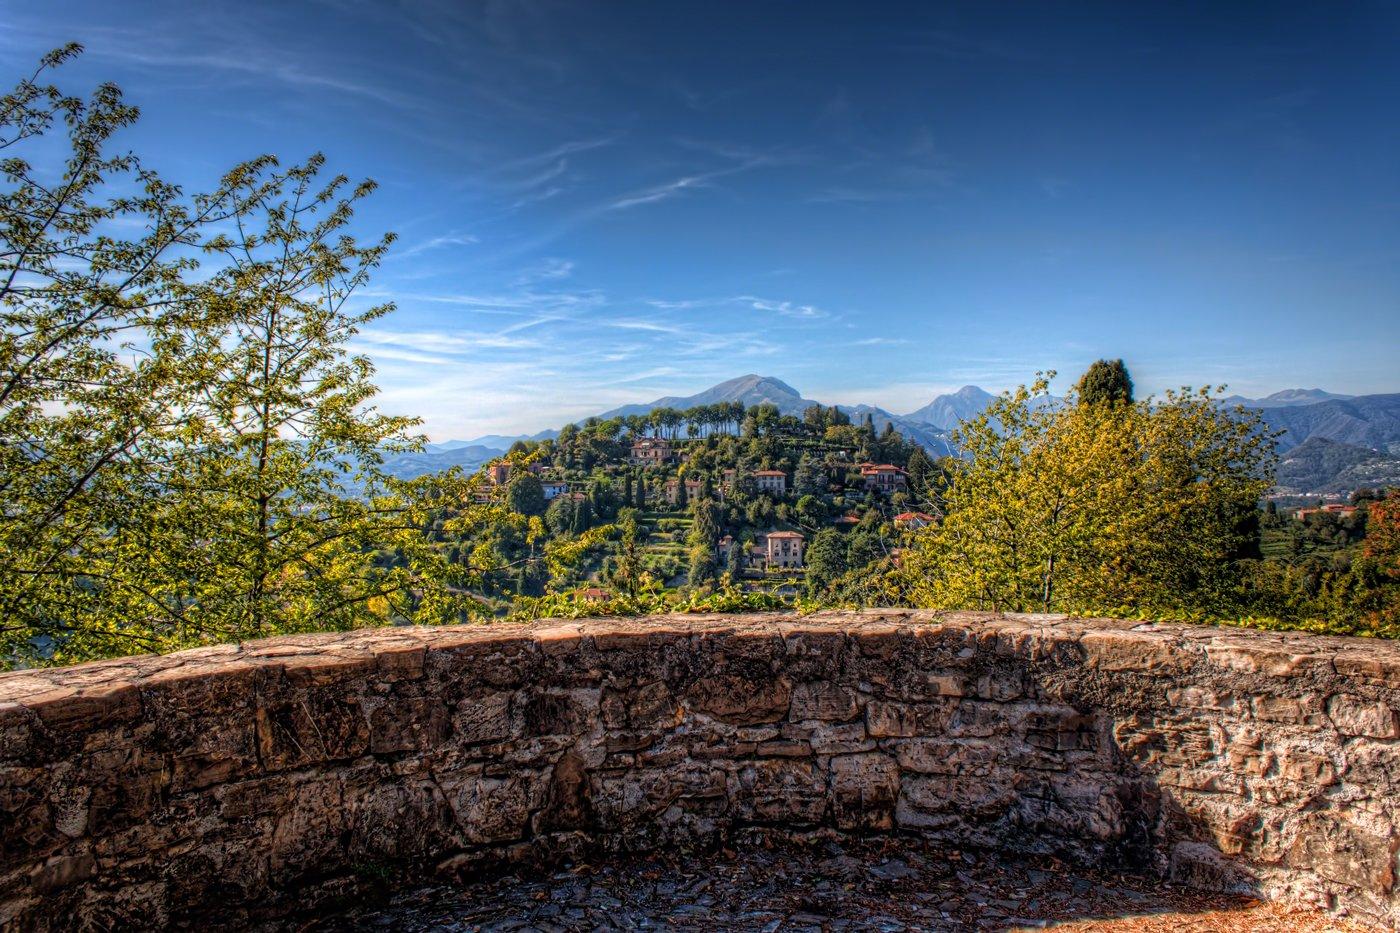 Bergamo in Italië. HDR-foto van de top van Castello di San Vigilio